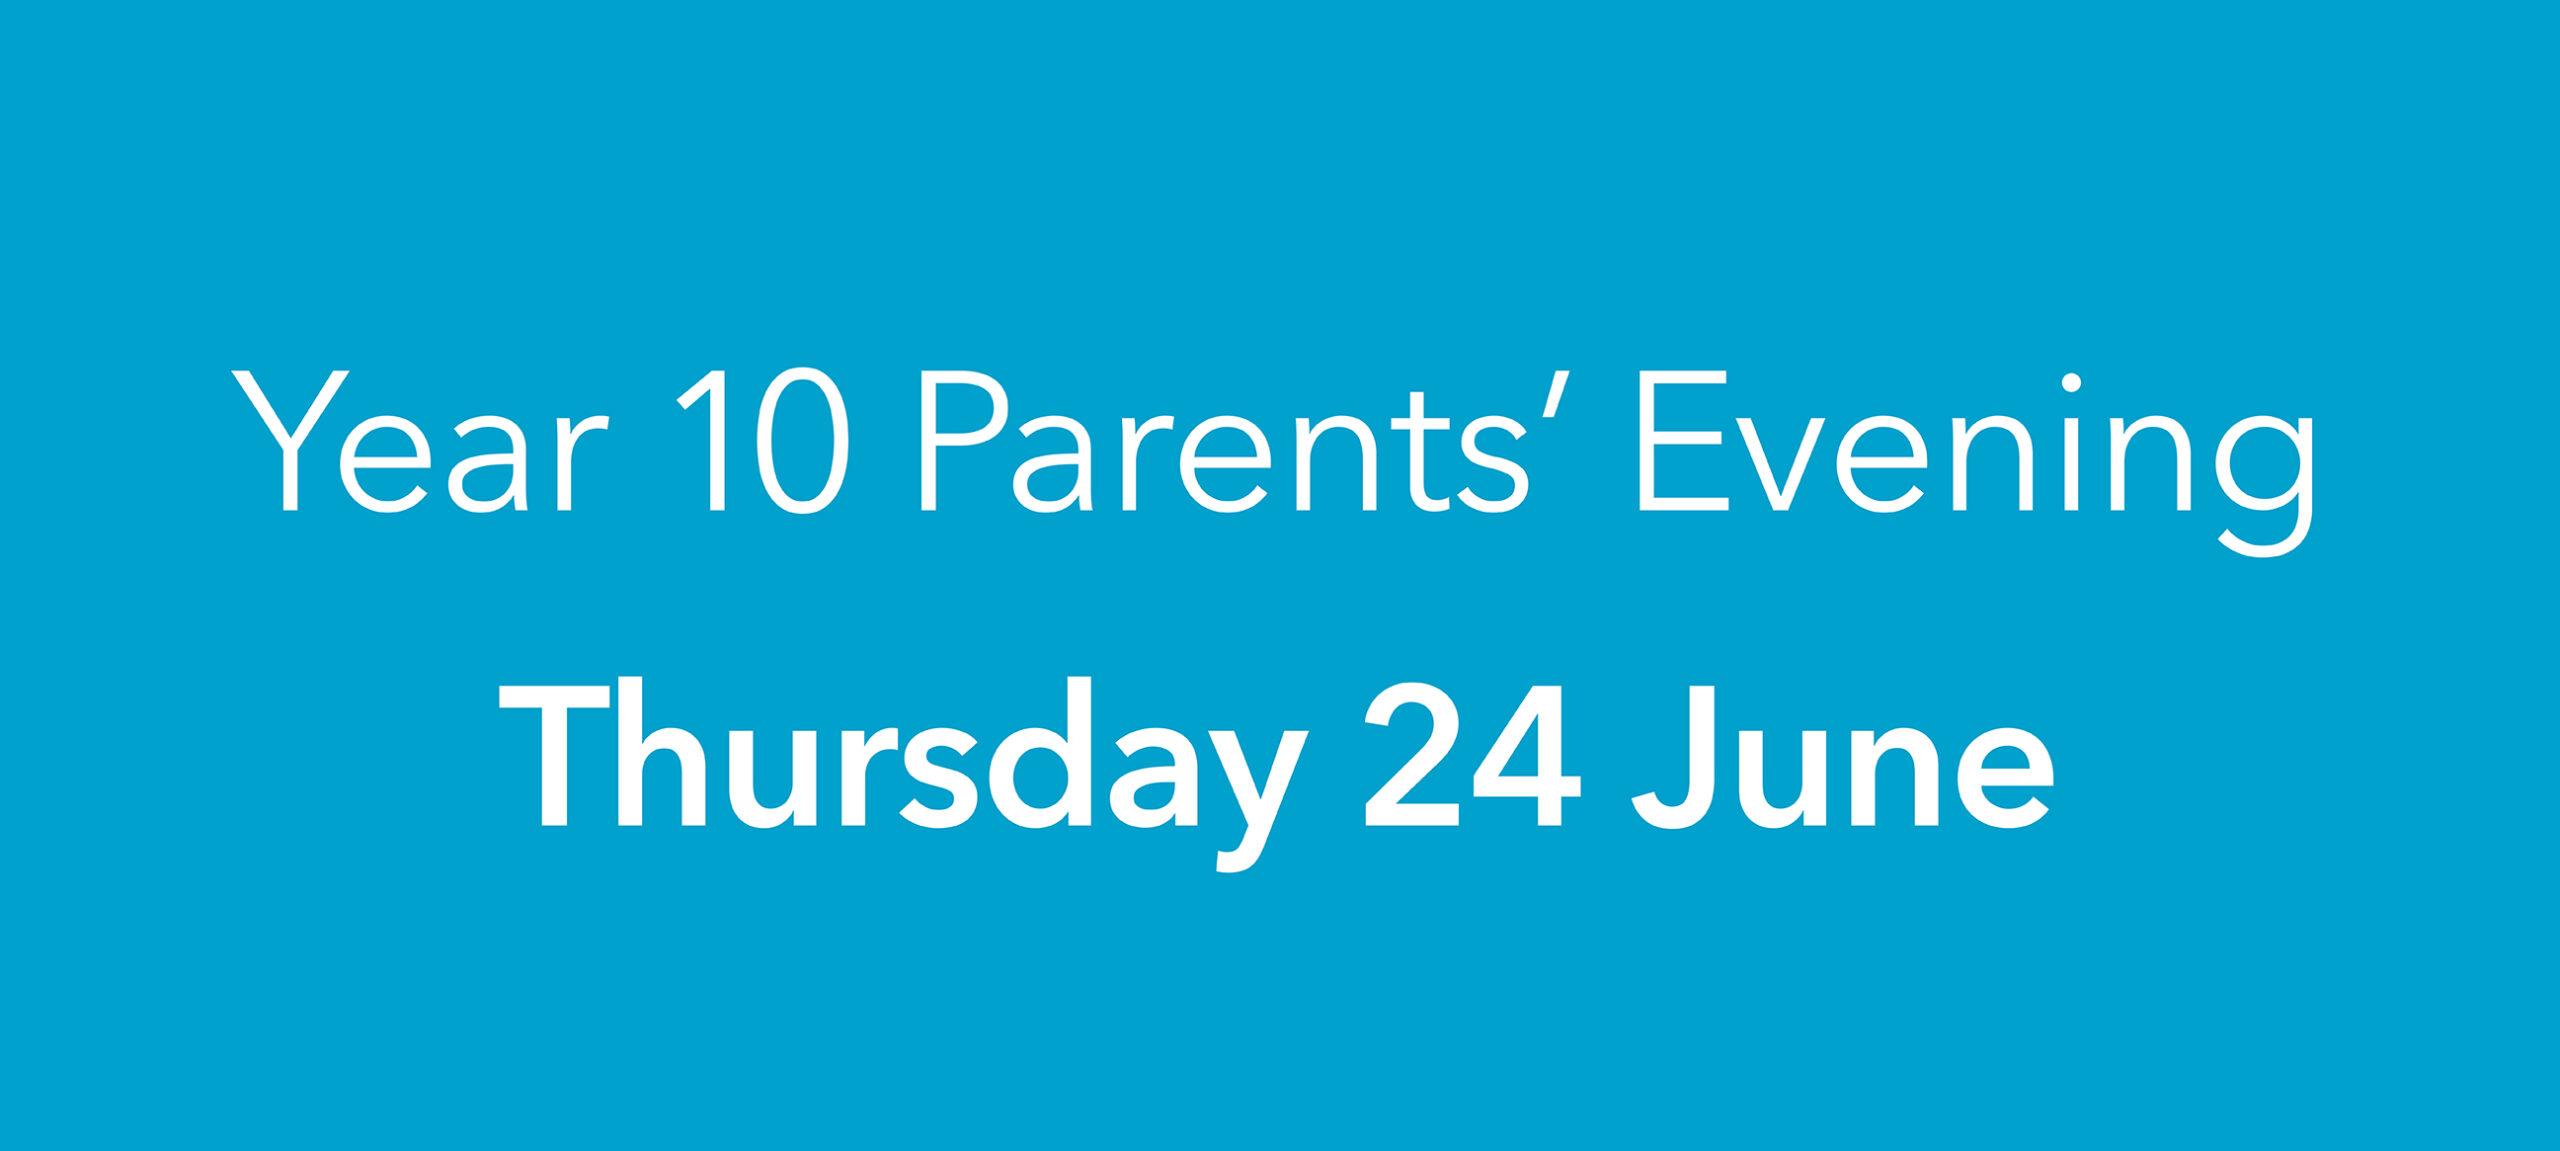 Year 10 Parents' Evening